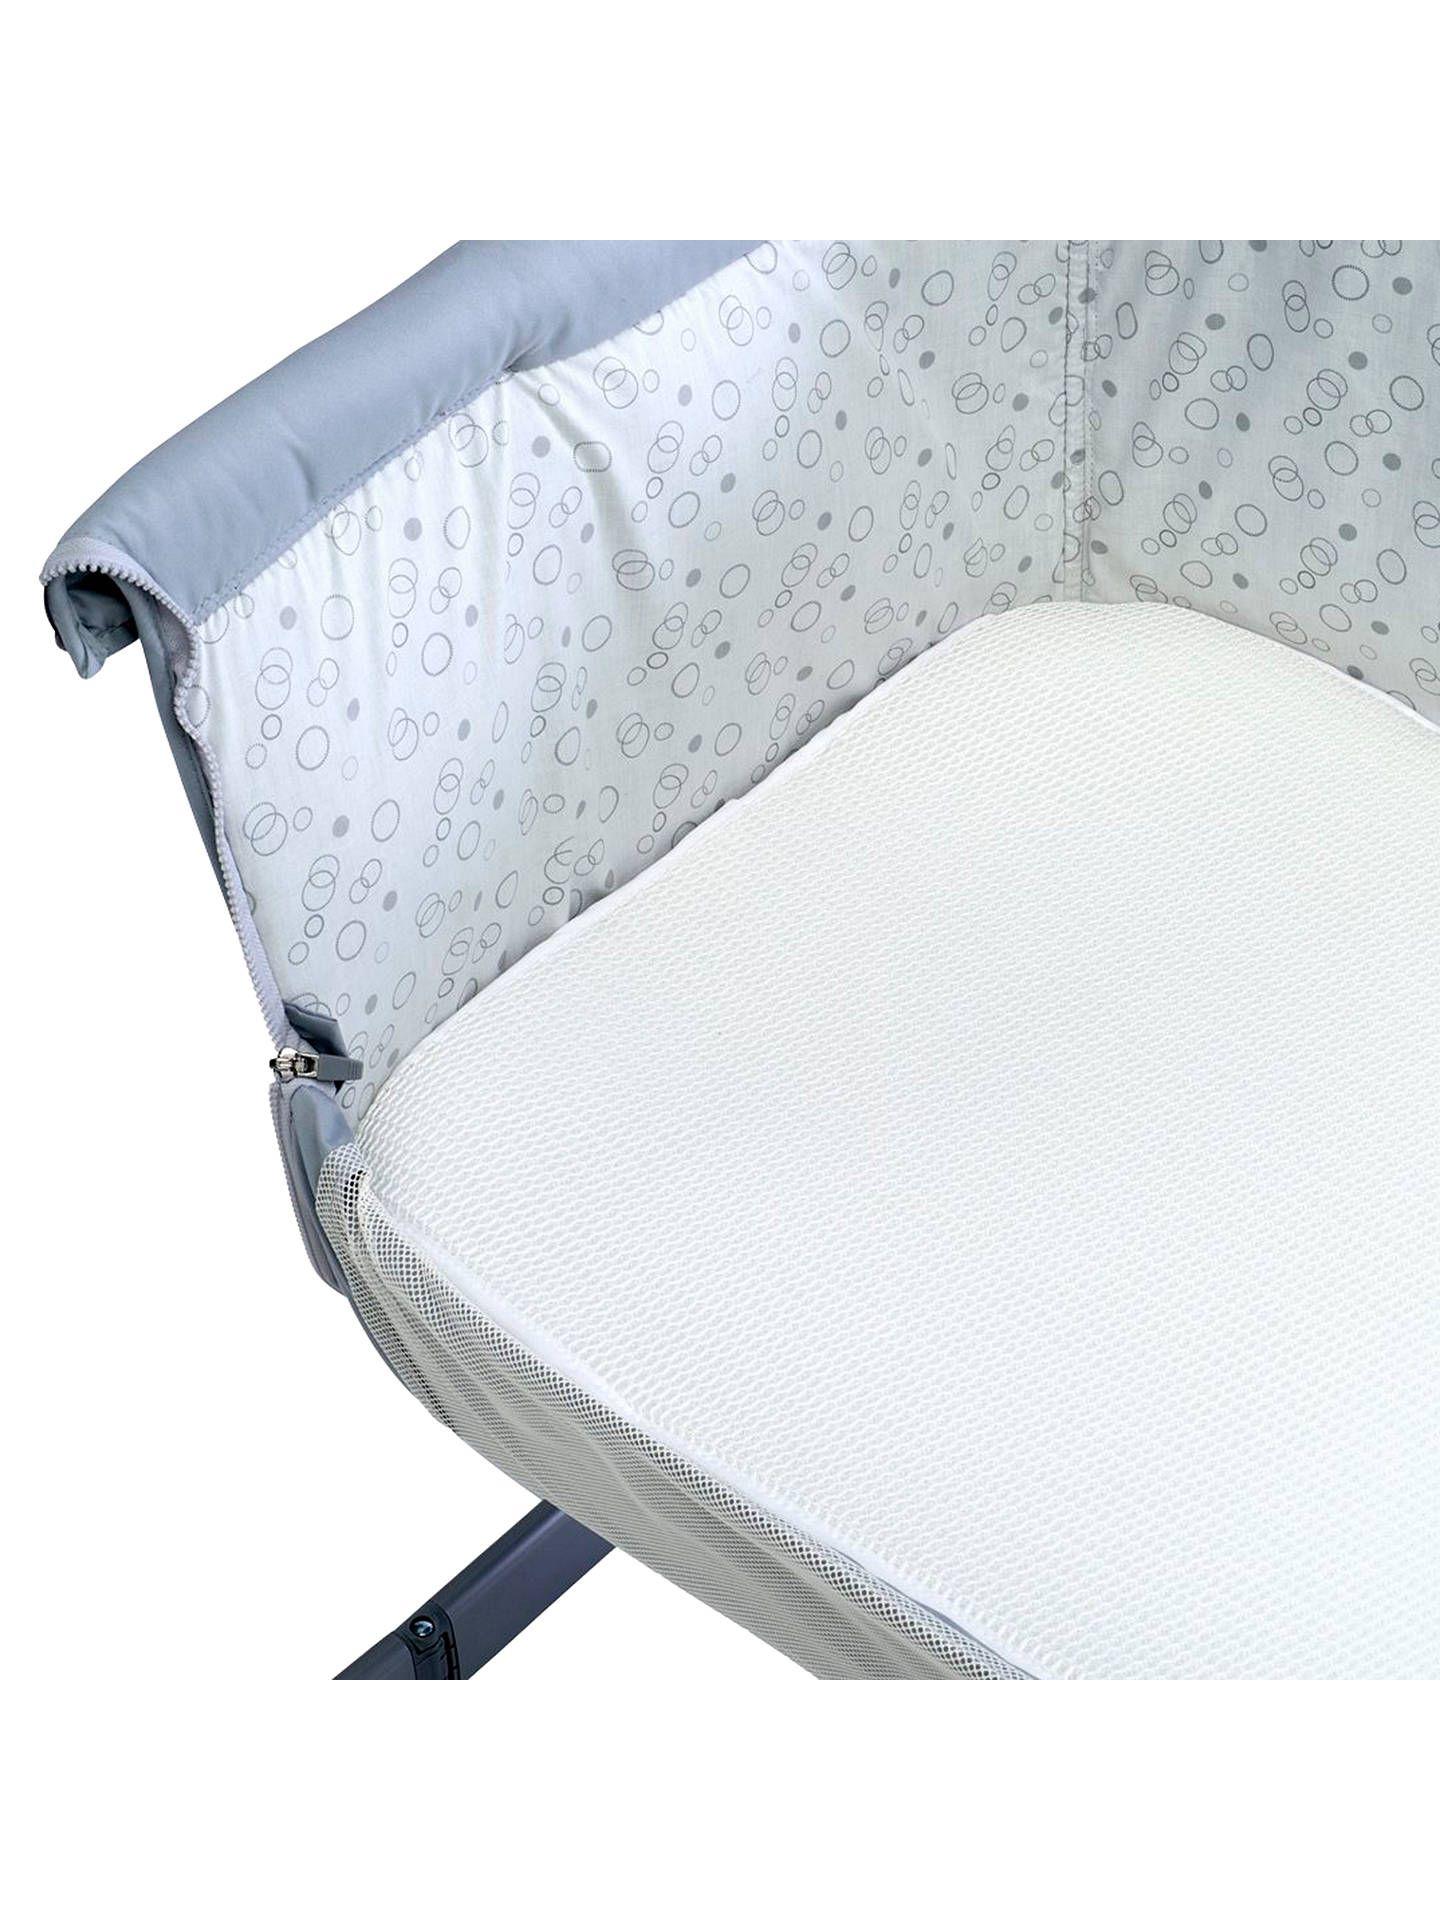 Chicco Night Breeze Bedside Crib Mattress Topper, White